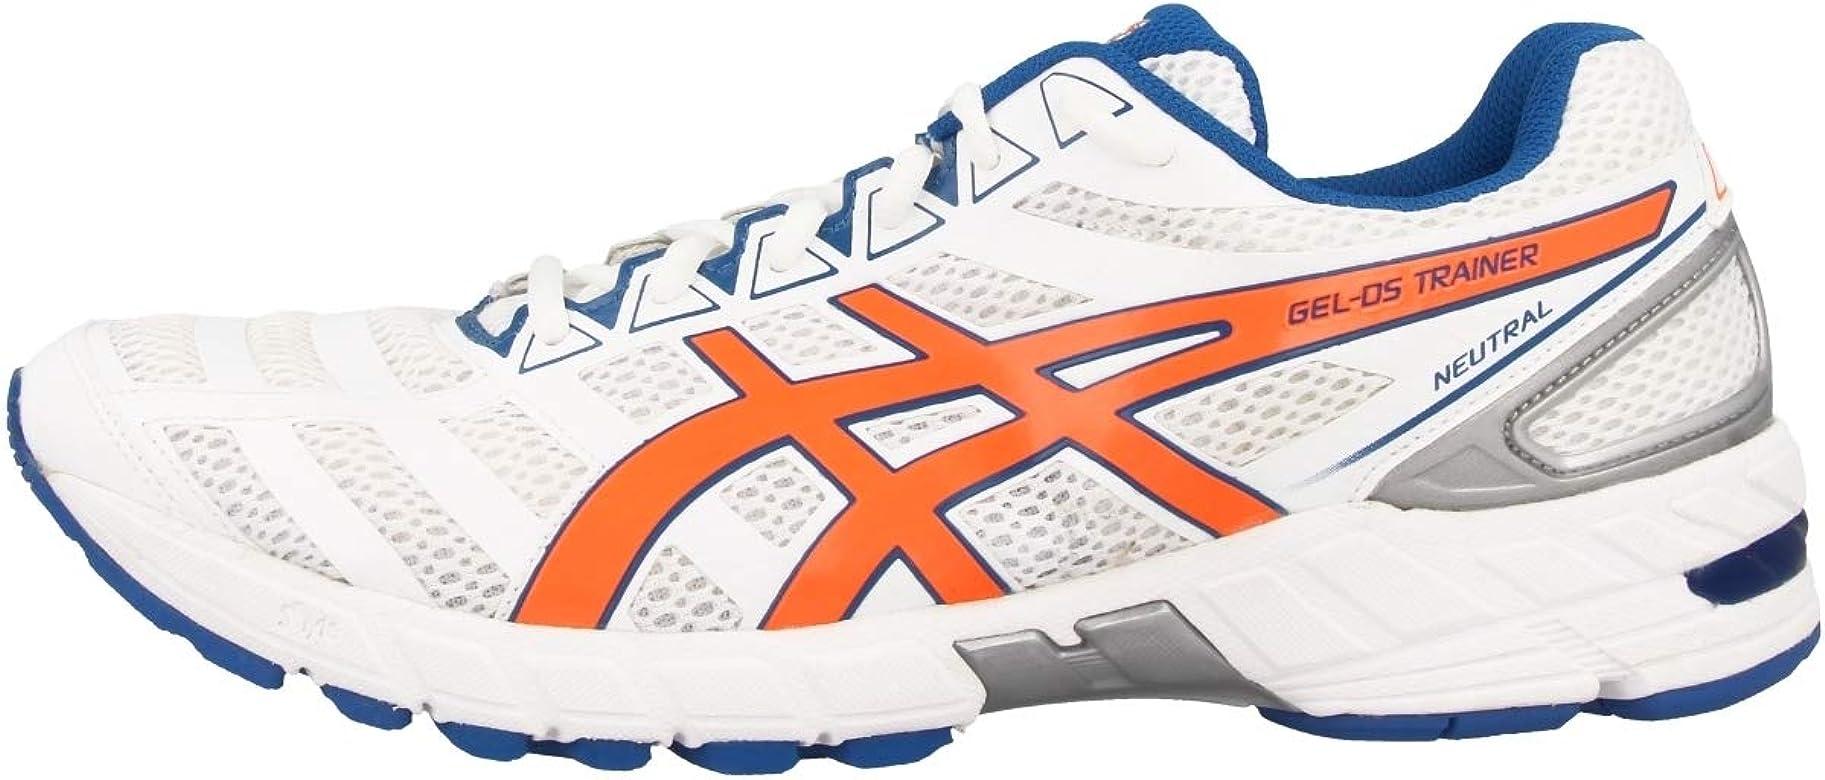 ASICS Gel-DS Trainer 18 Zapatilla de Running Neutra Caballero, Blanco/Azul/Naranja, 46: ASICS: Amazon.es: Zapatos y complementos